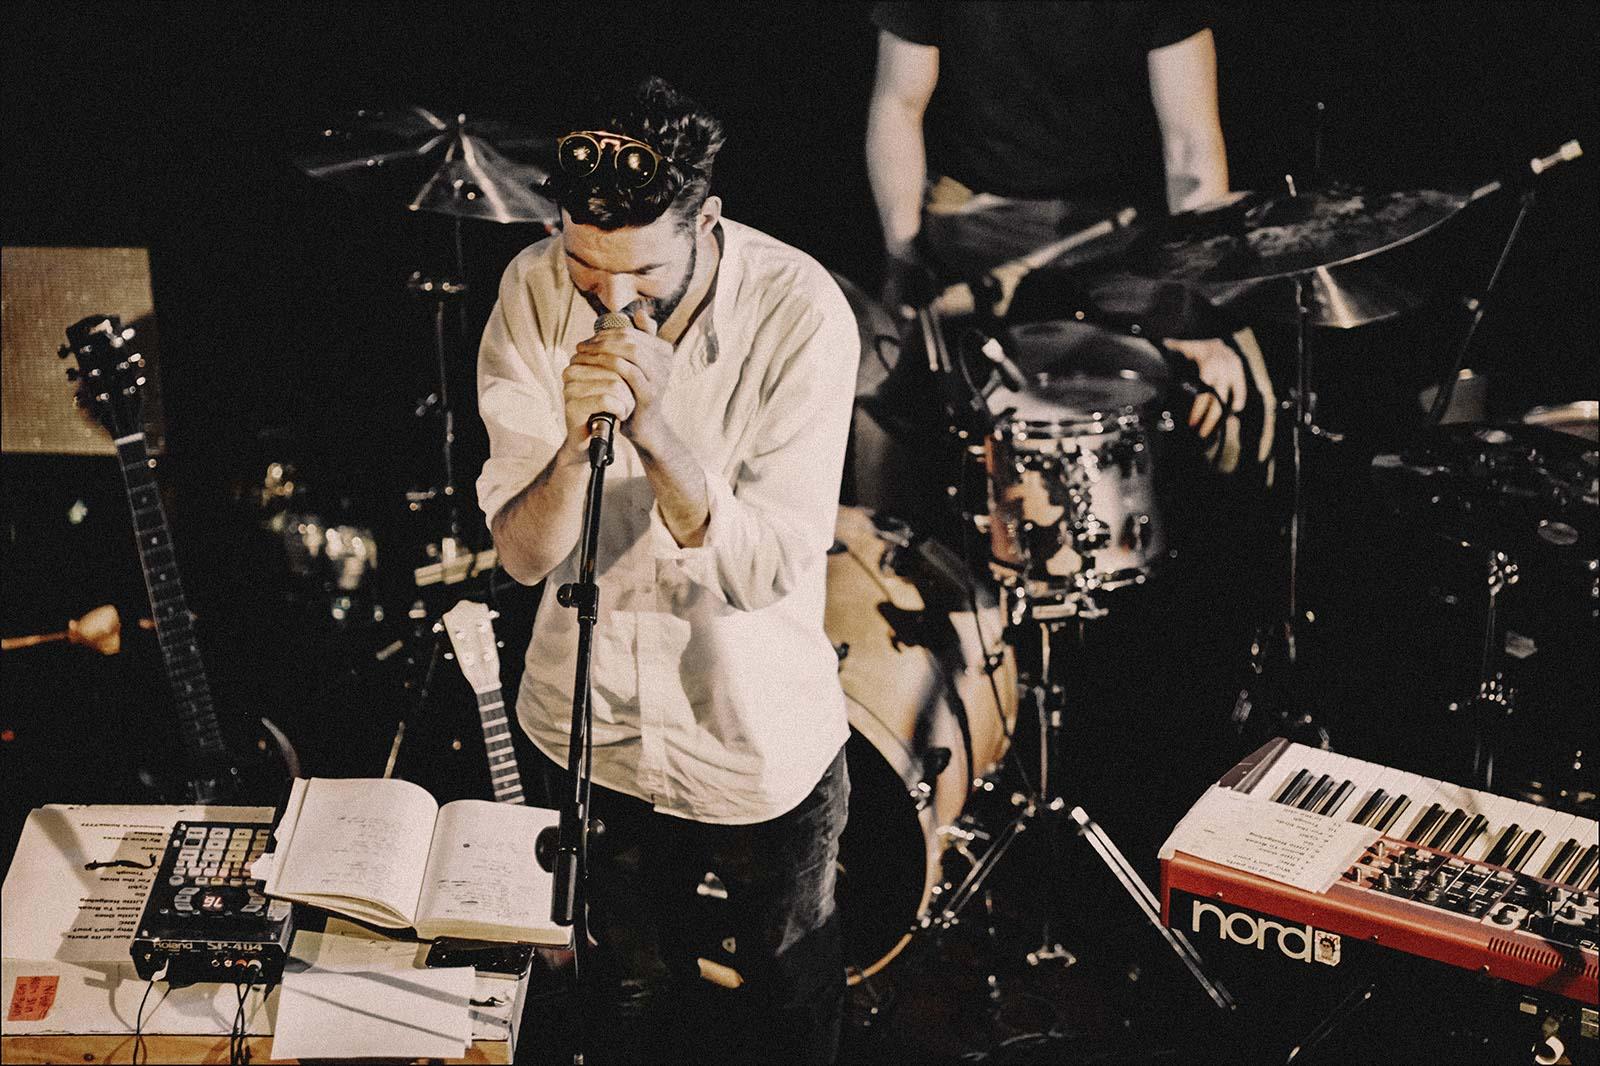 come_on_live_long_album_launch_whelans_dublin014.jpg